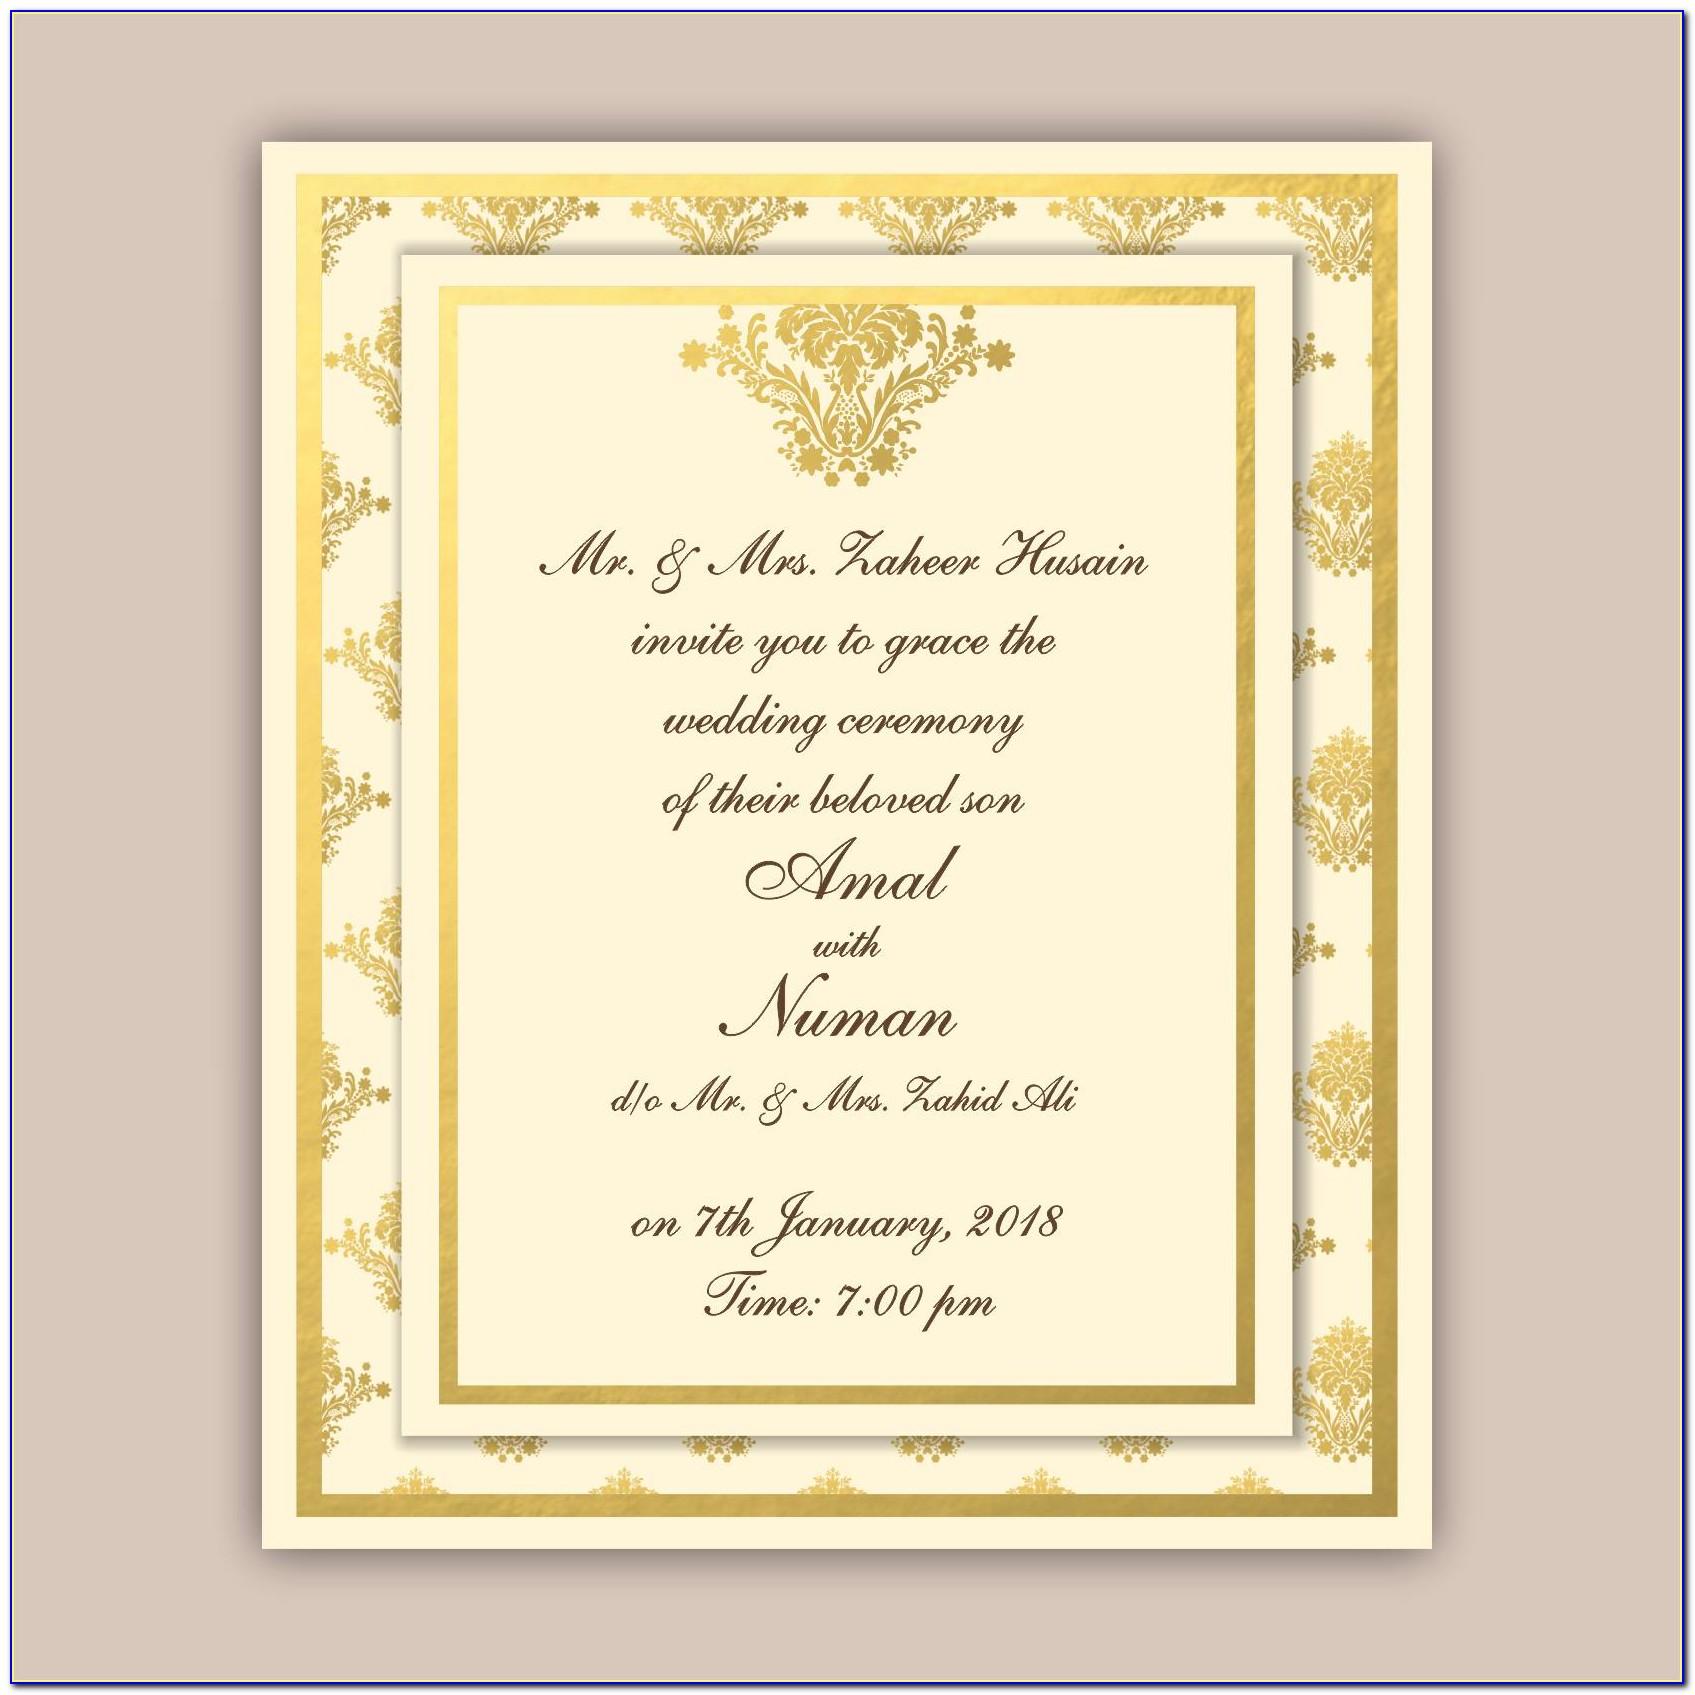 Walima Wedding Invitation Cards